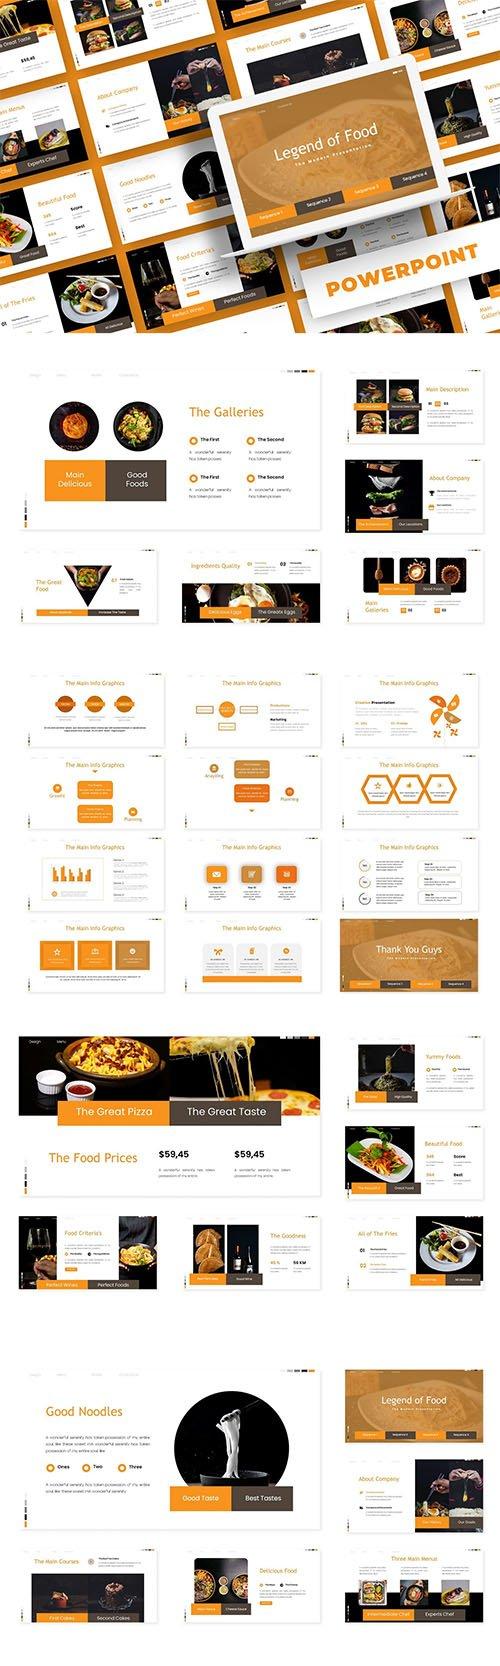 Legend Of Food - PowerPoint, Keynote, Google Slides Templates